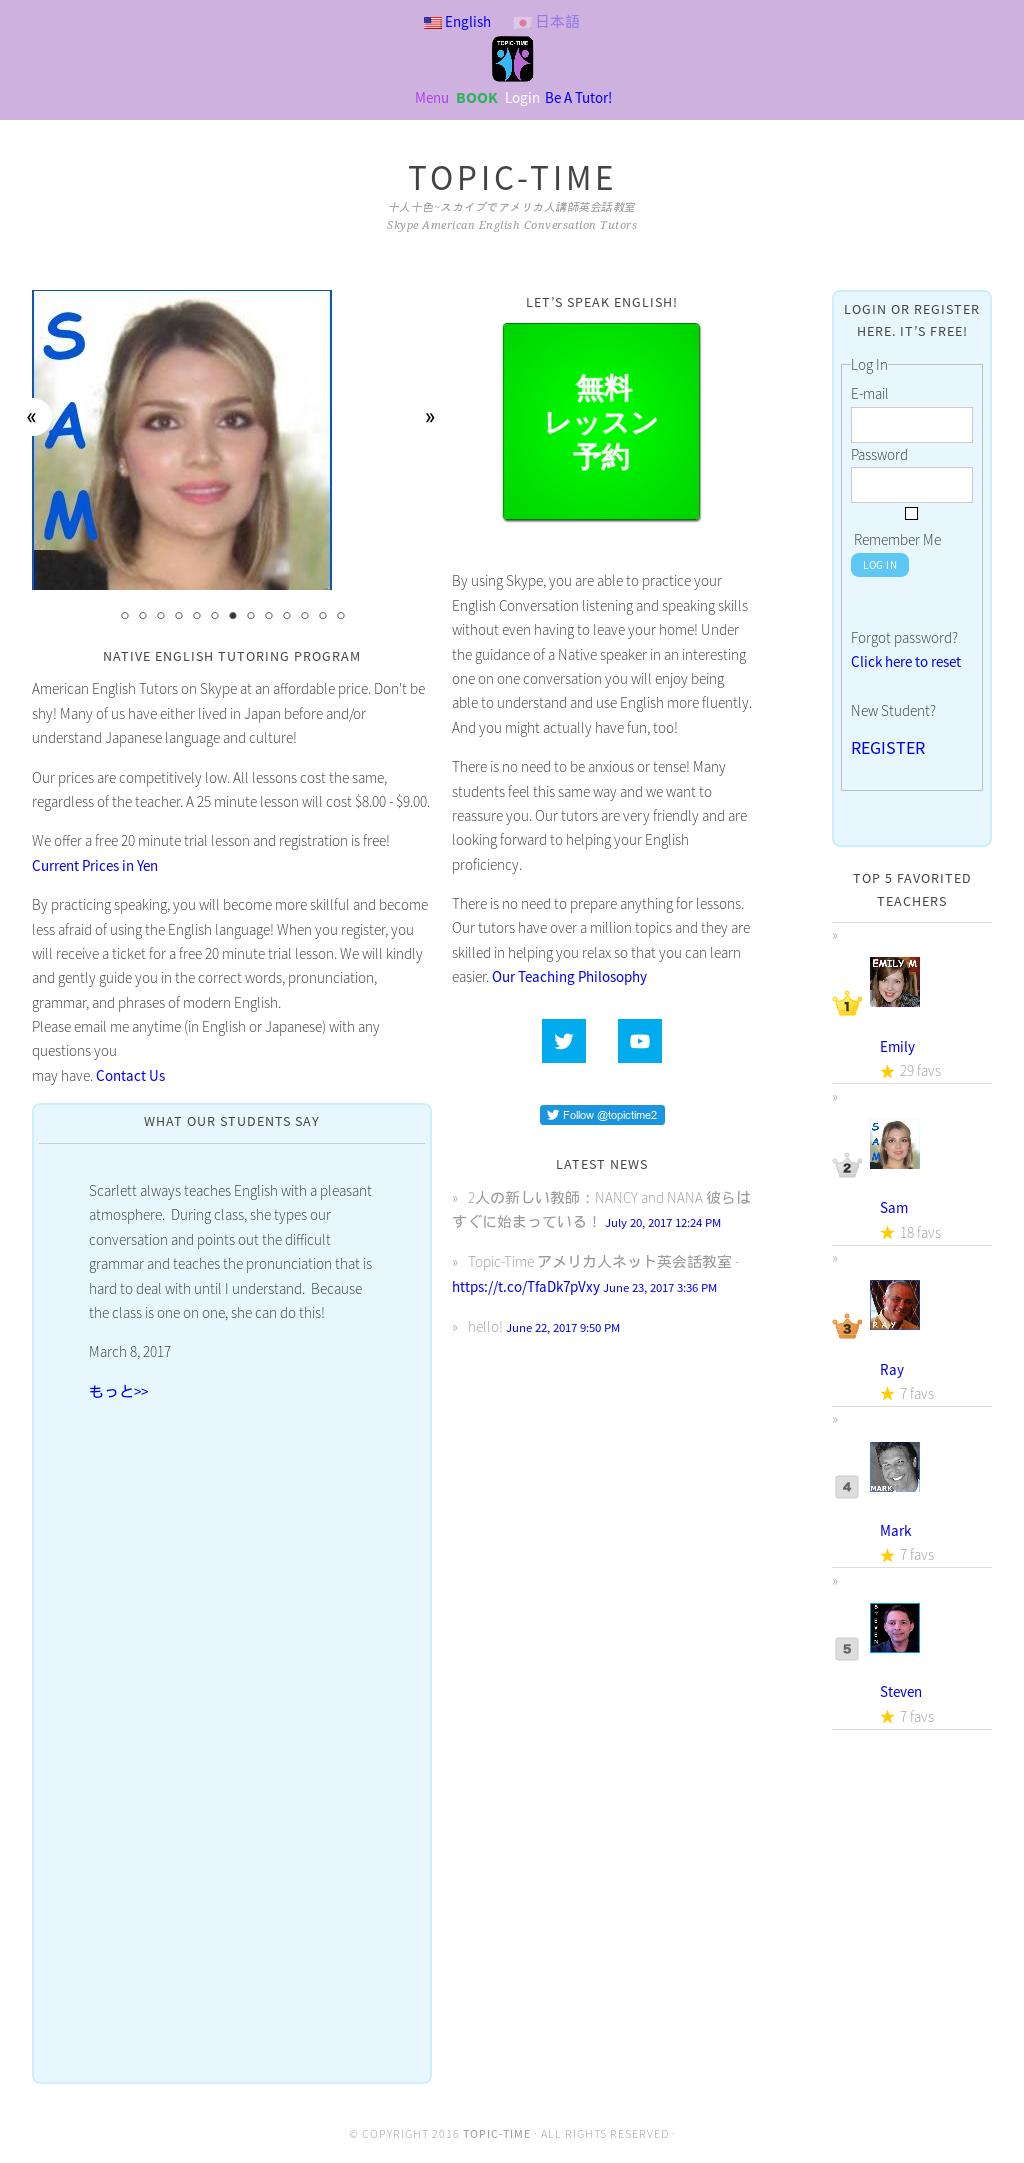 Helloenglish Competitors, Revenue and Employees - Owler Company Profile